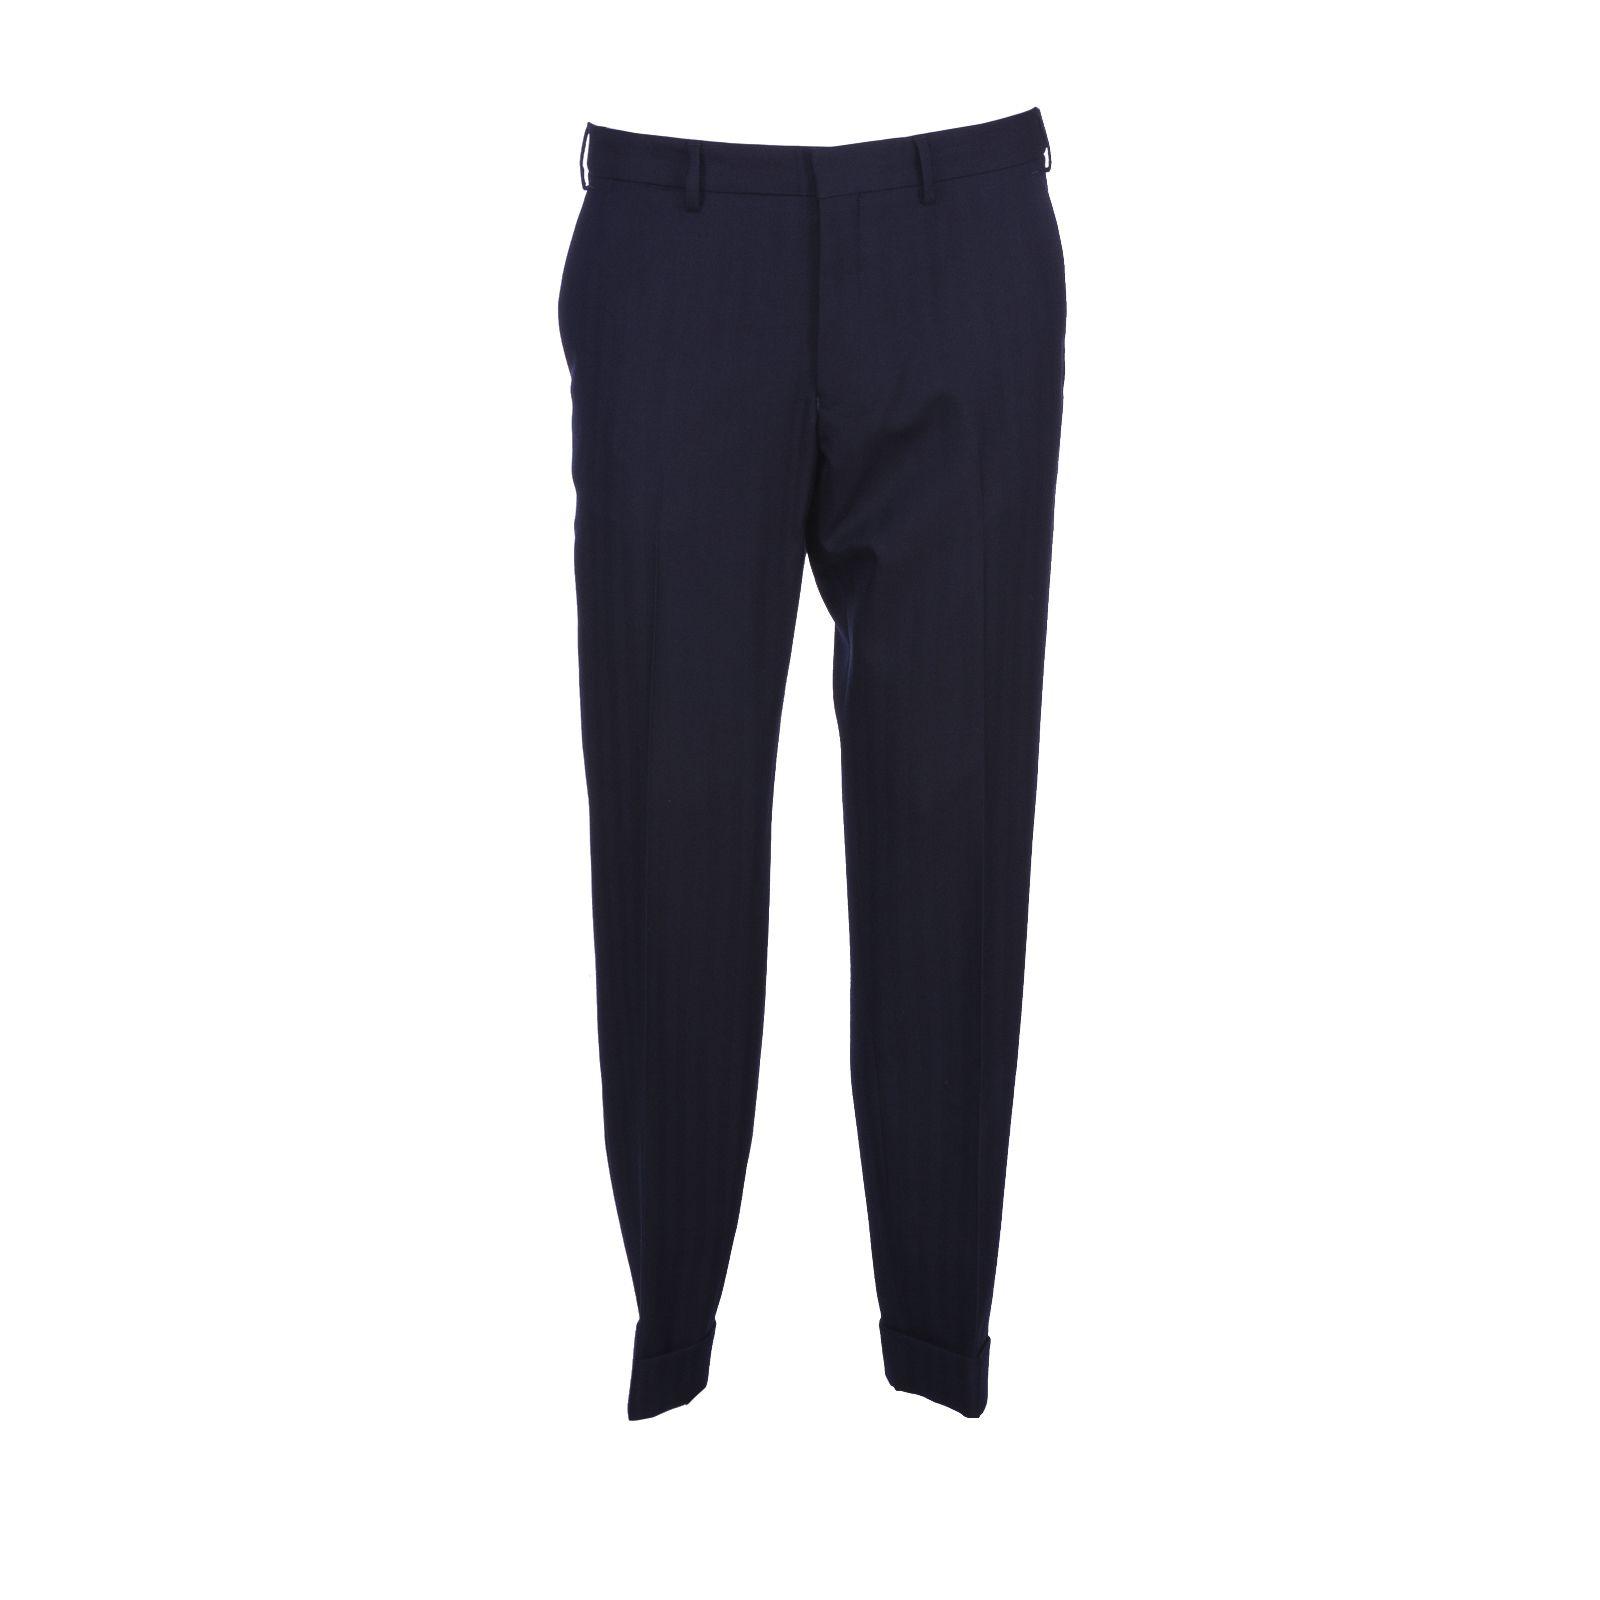 Dries Van Noten Tailored Trousers